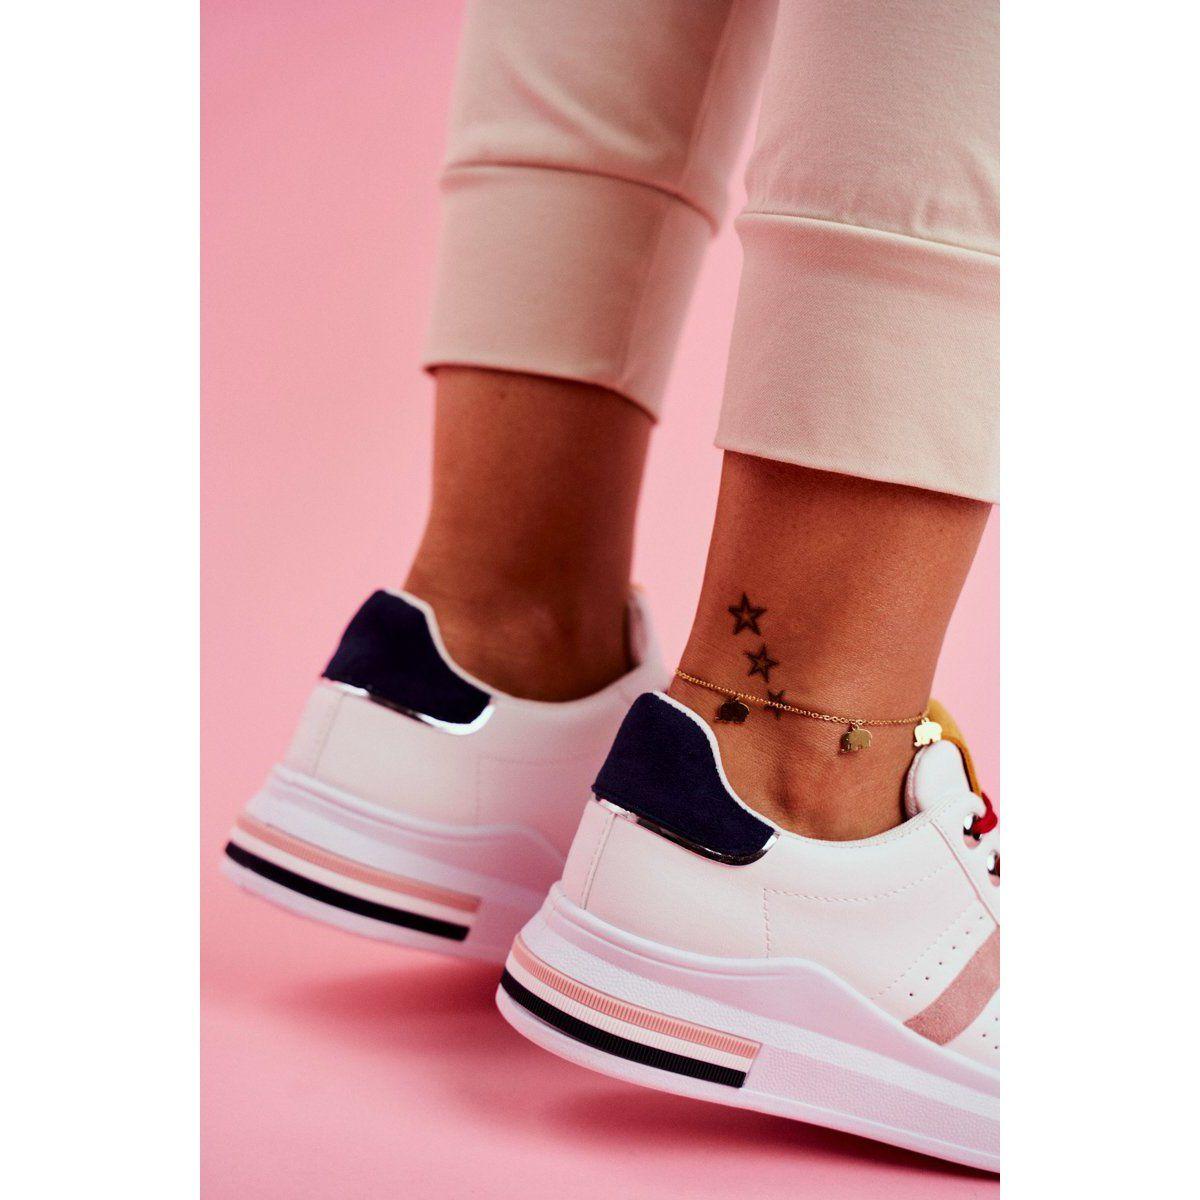 Ps1 Sportowe Damskie Buty Bialo Granatowe Mirra Biale Wielokolorowe Adidas Stan Smith Sneakers Adidas Sneakers